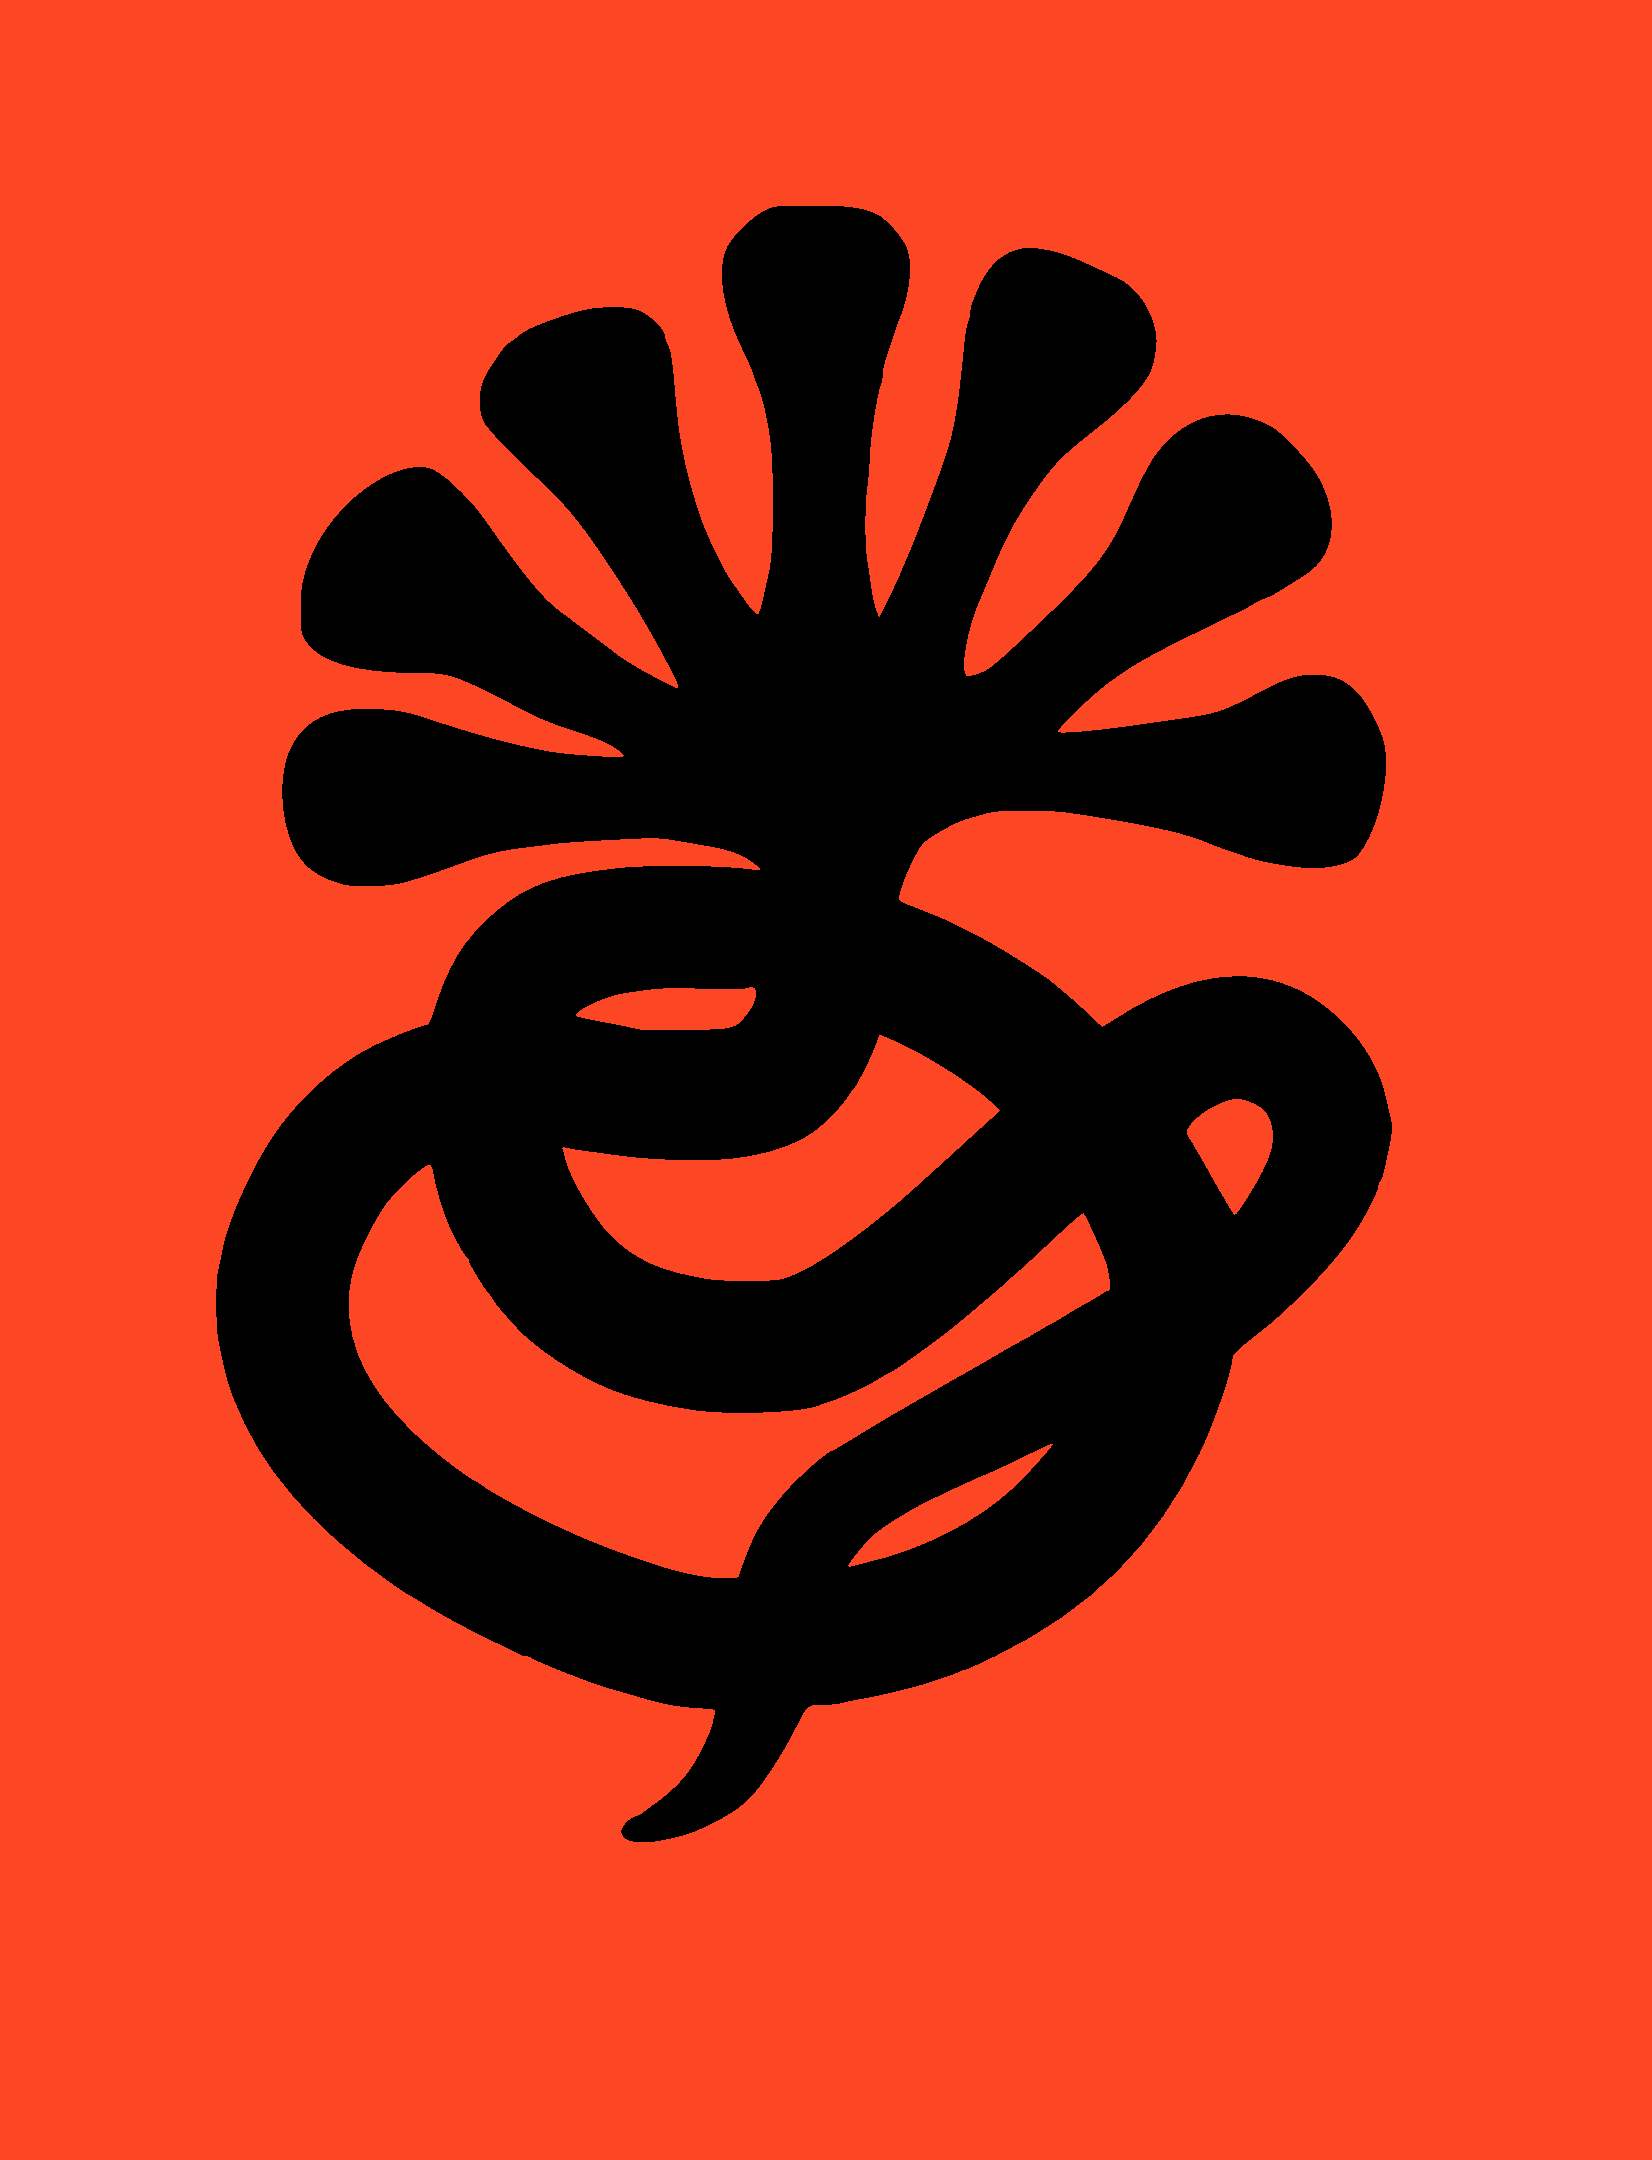 Kwanzaa Seven Principles Poster 24 x 18 Style 4 | Etsy | 2160x1652